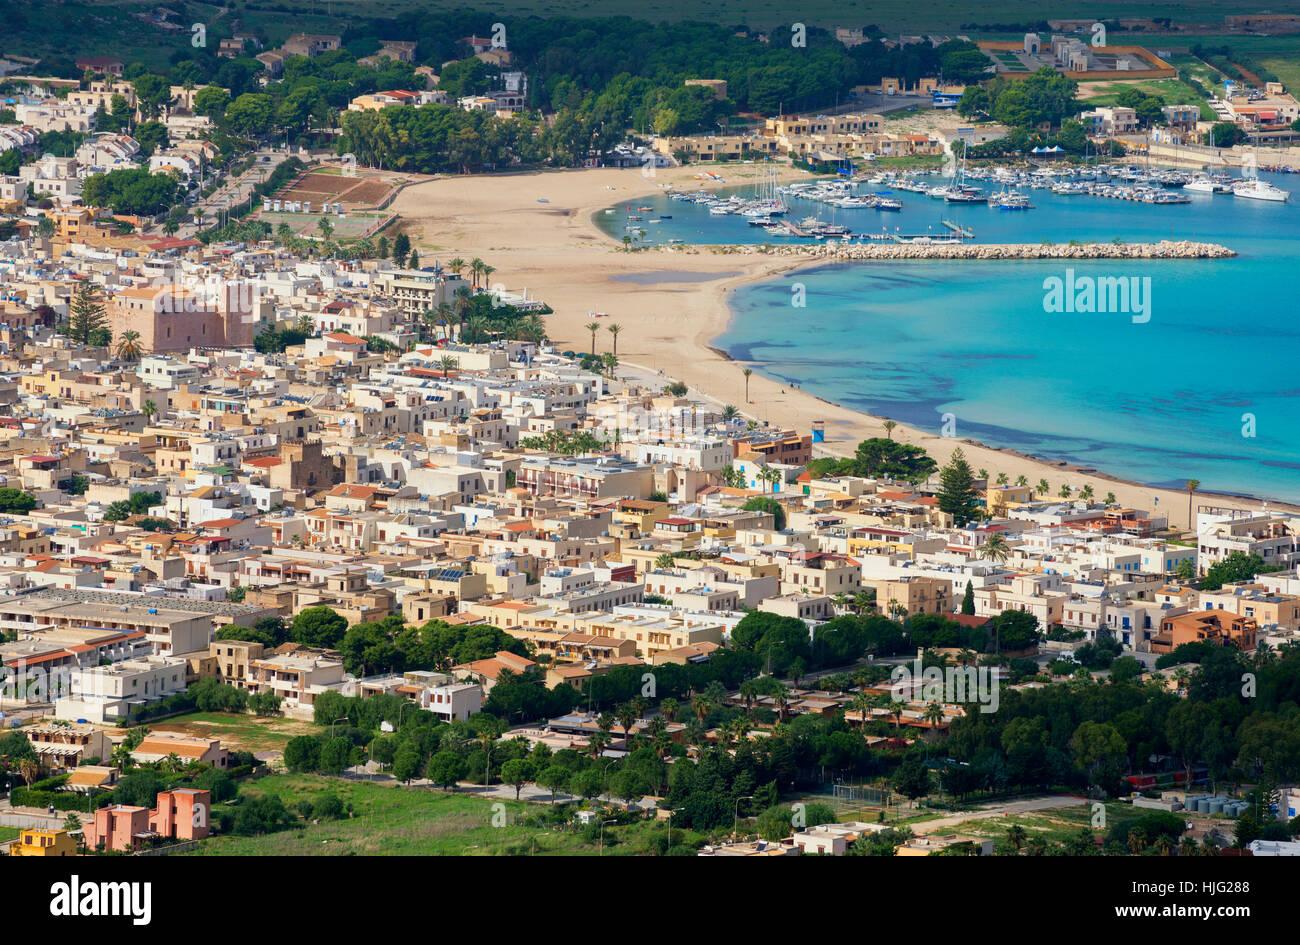 San Vito Lo Capo, aerial view, Sicily, Italy Stock Photo